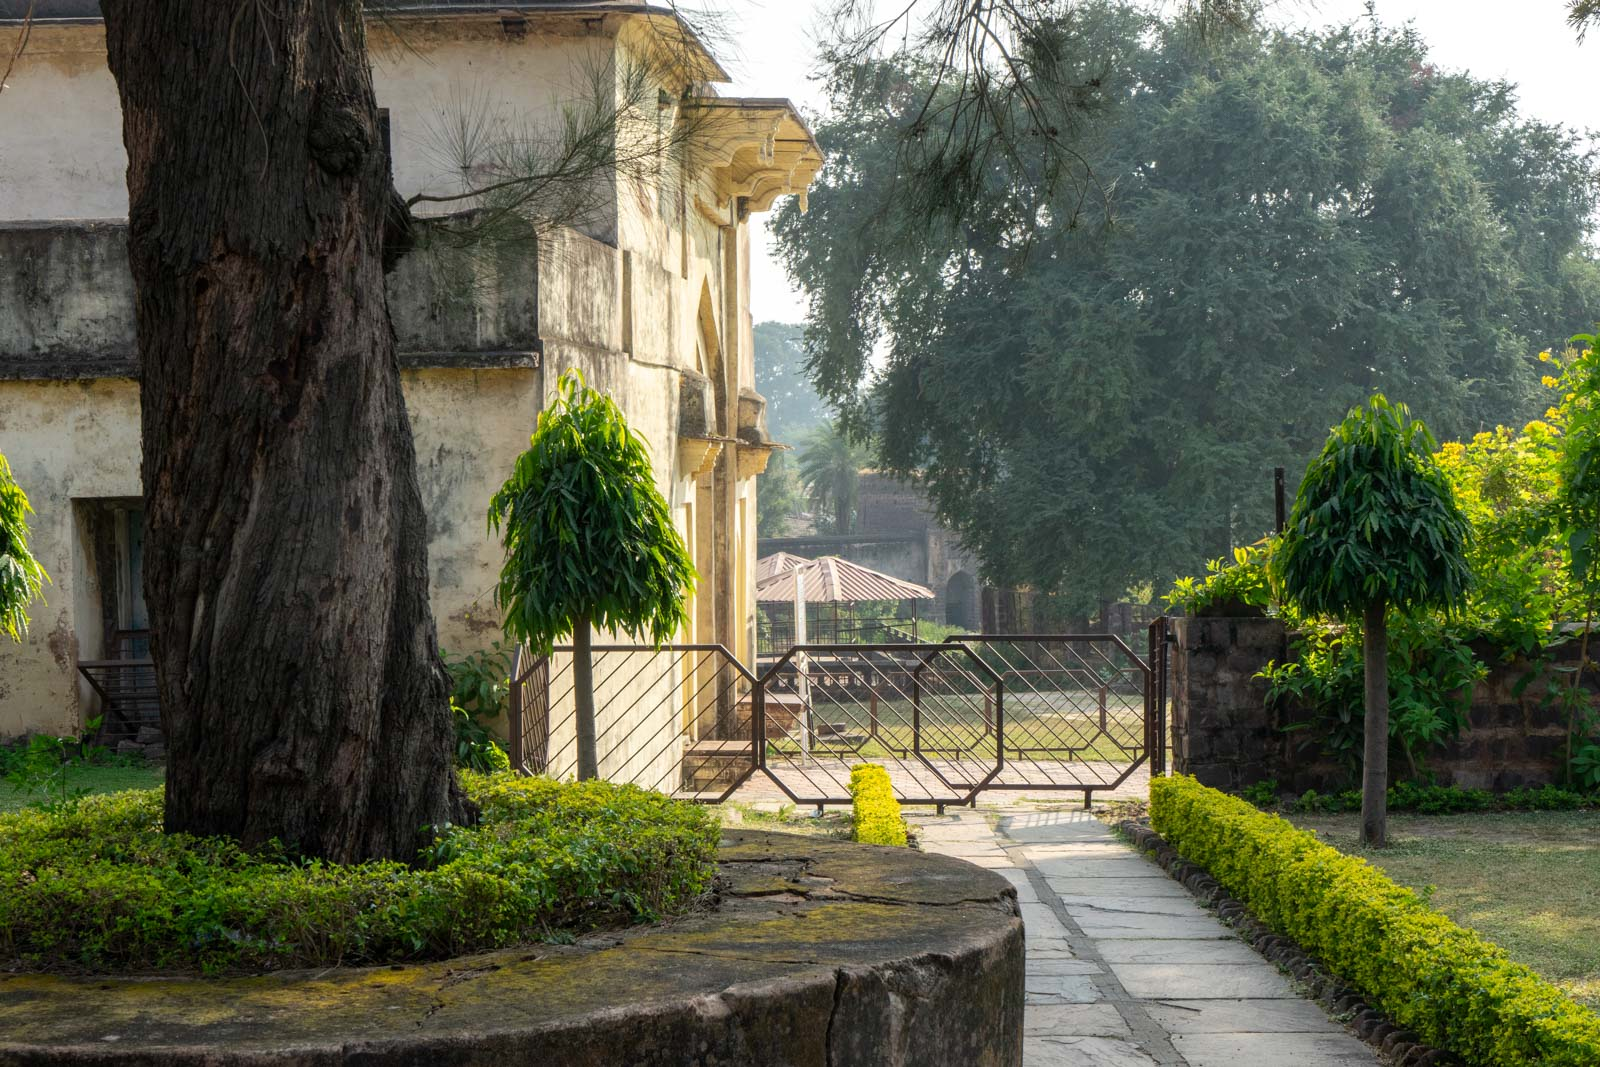 Islamnagar, Bhopal, India